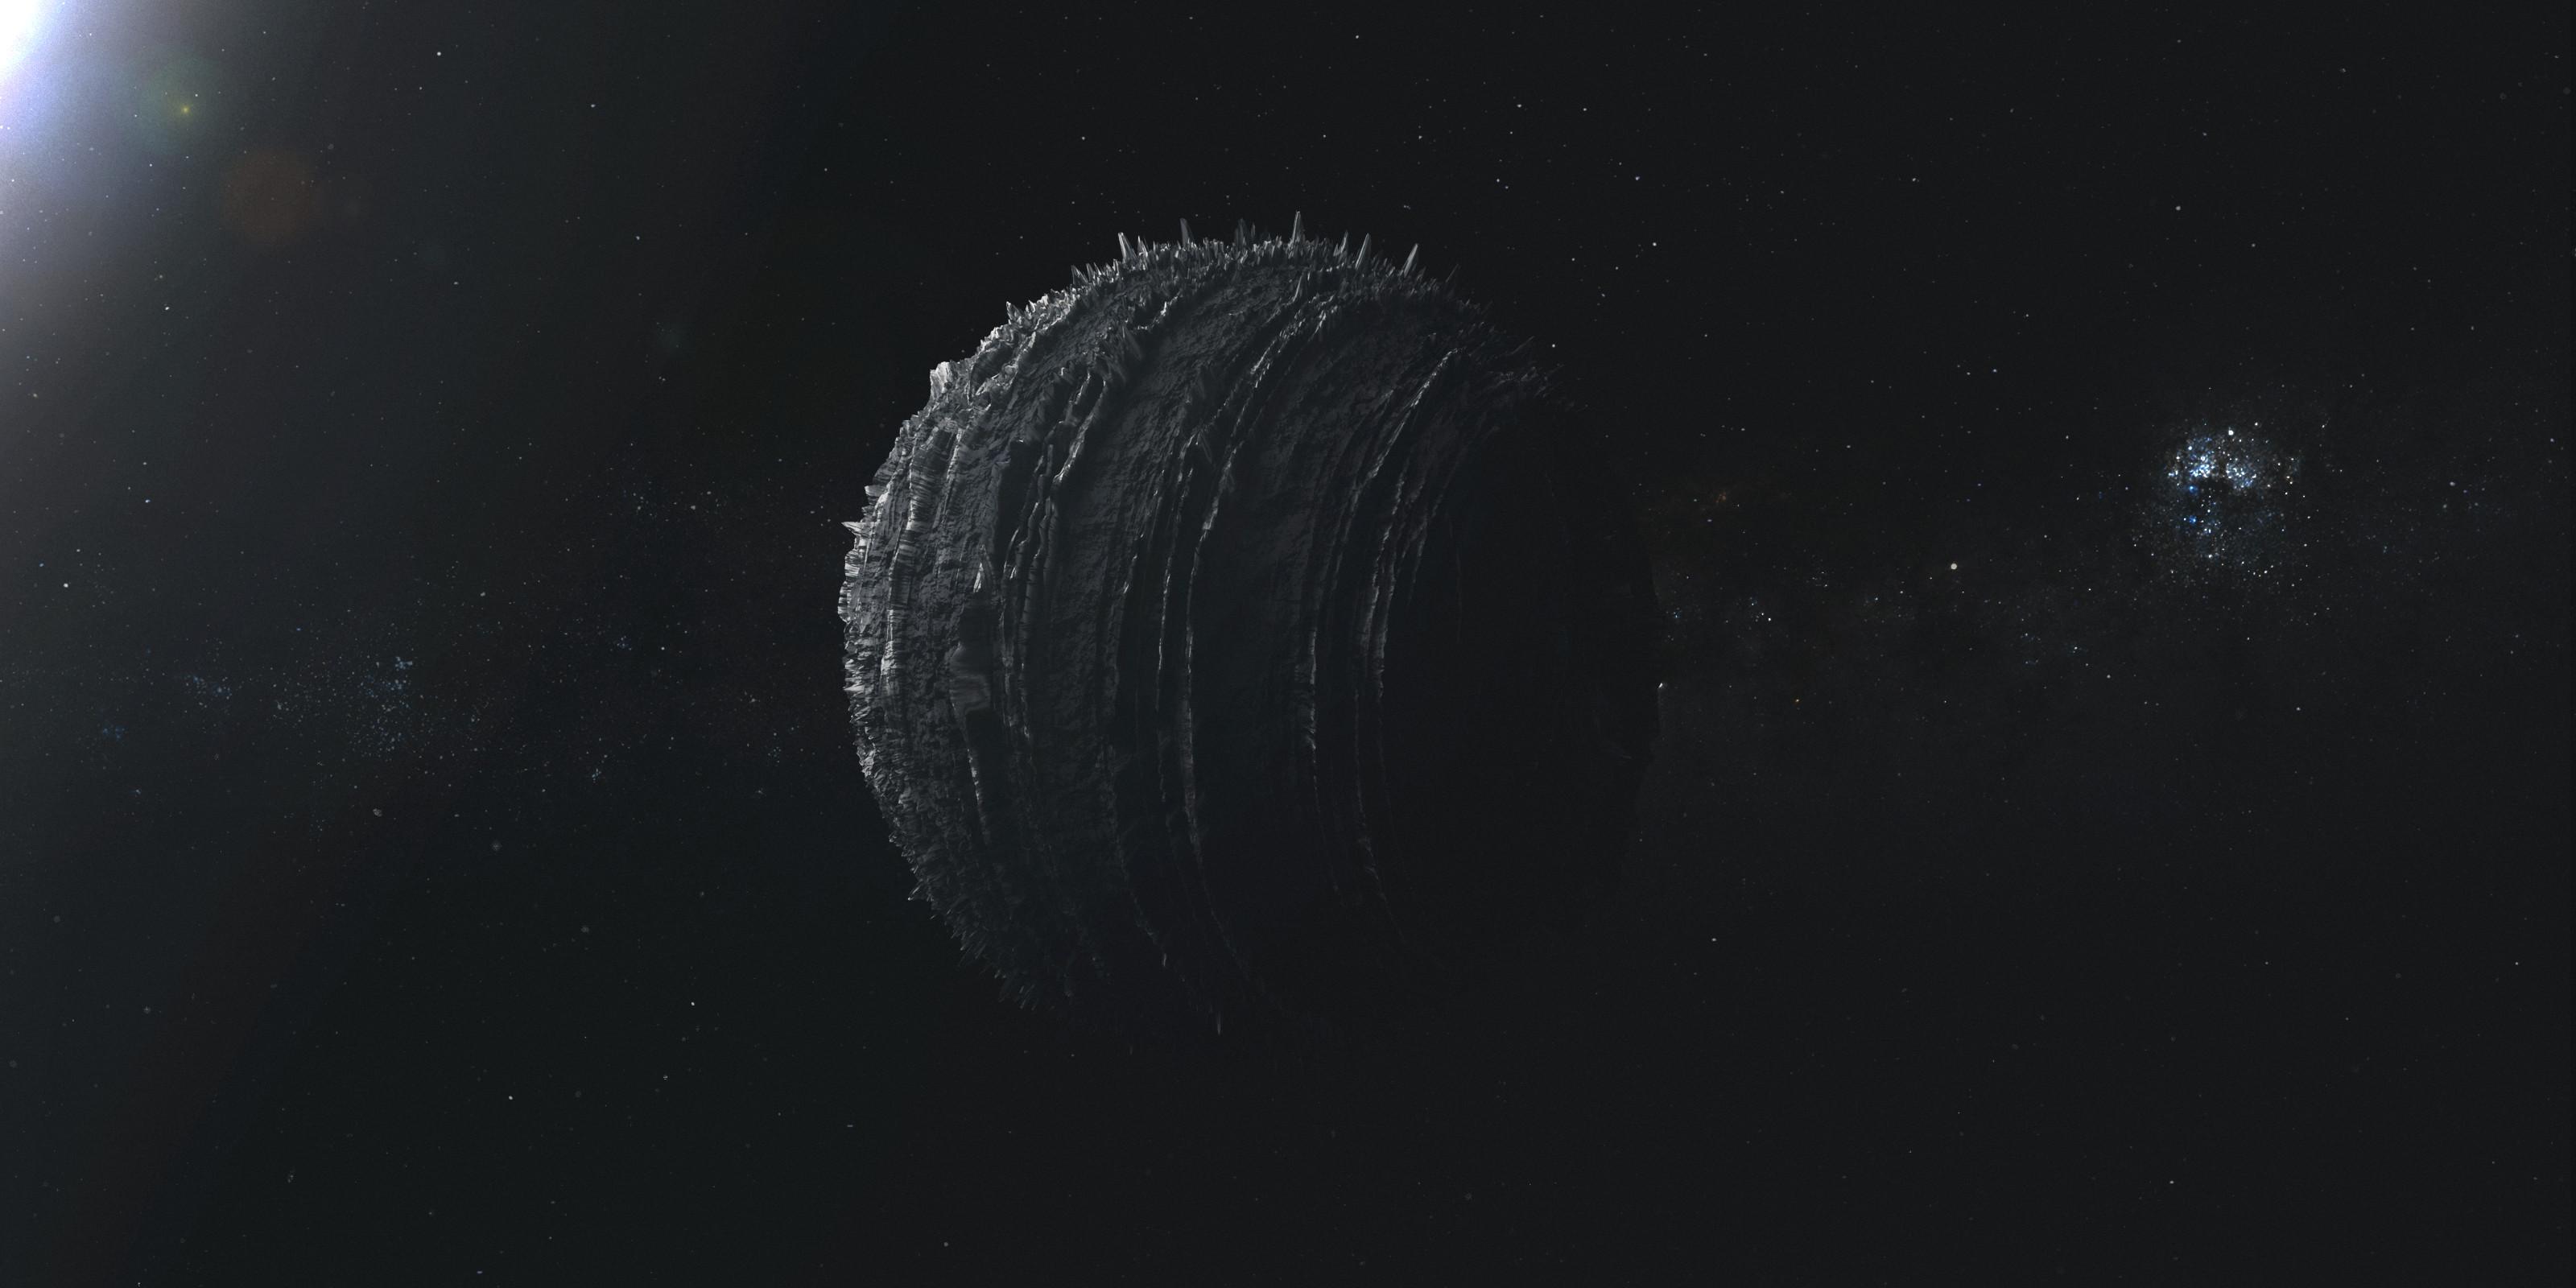 Zylog Planet